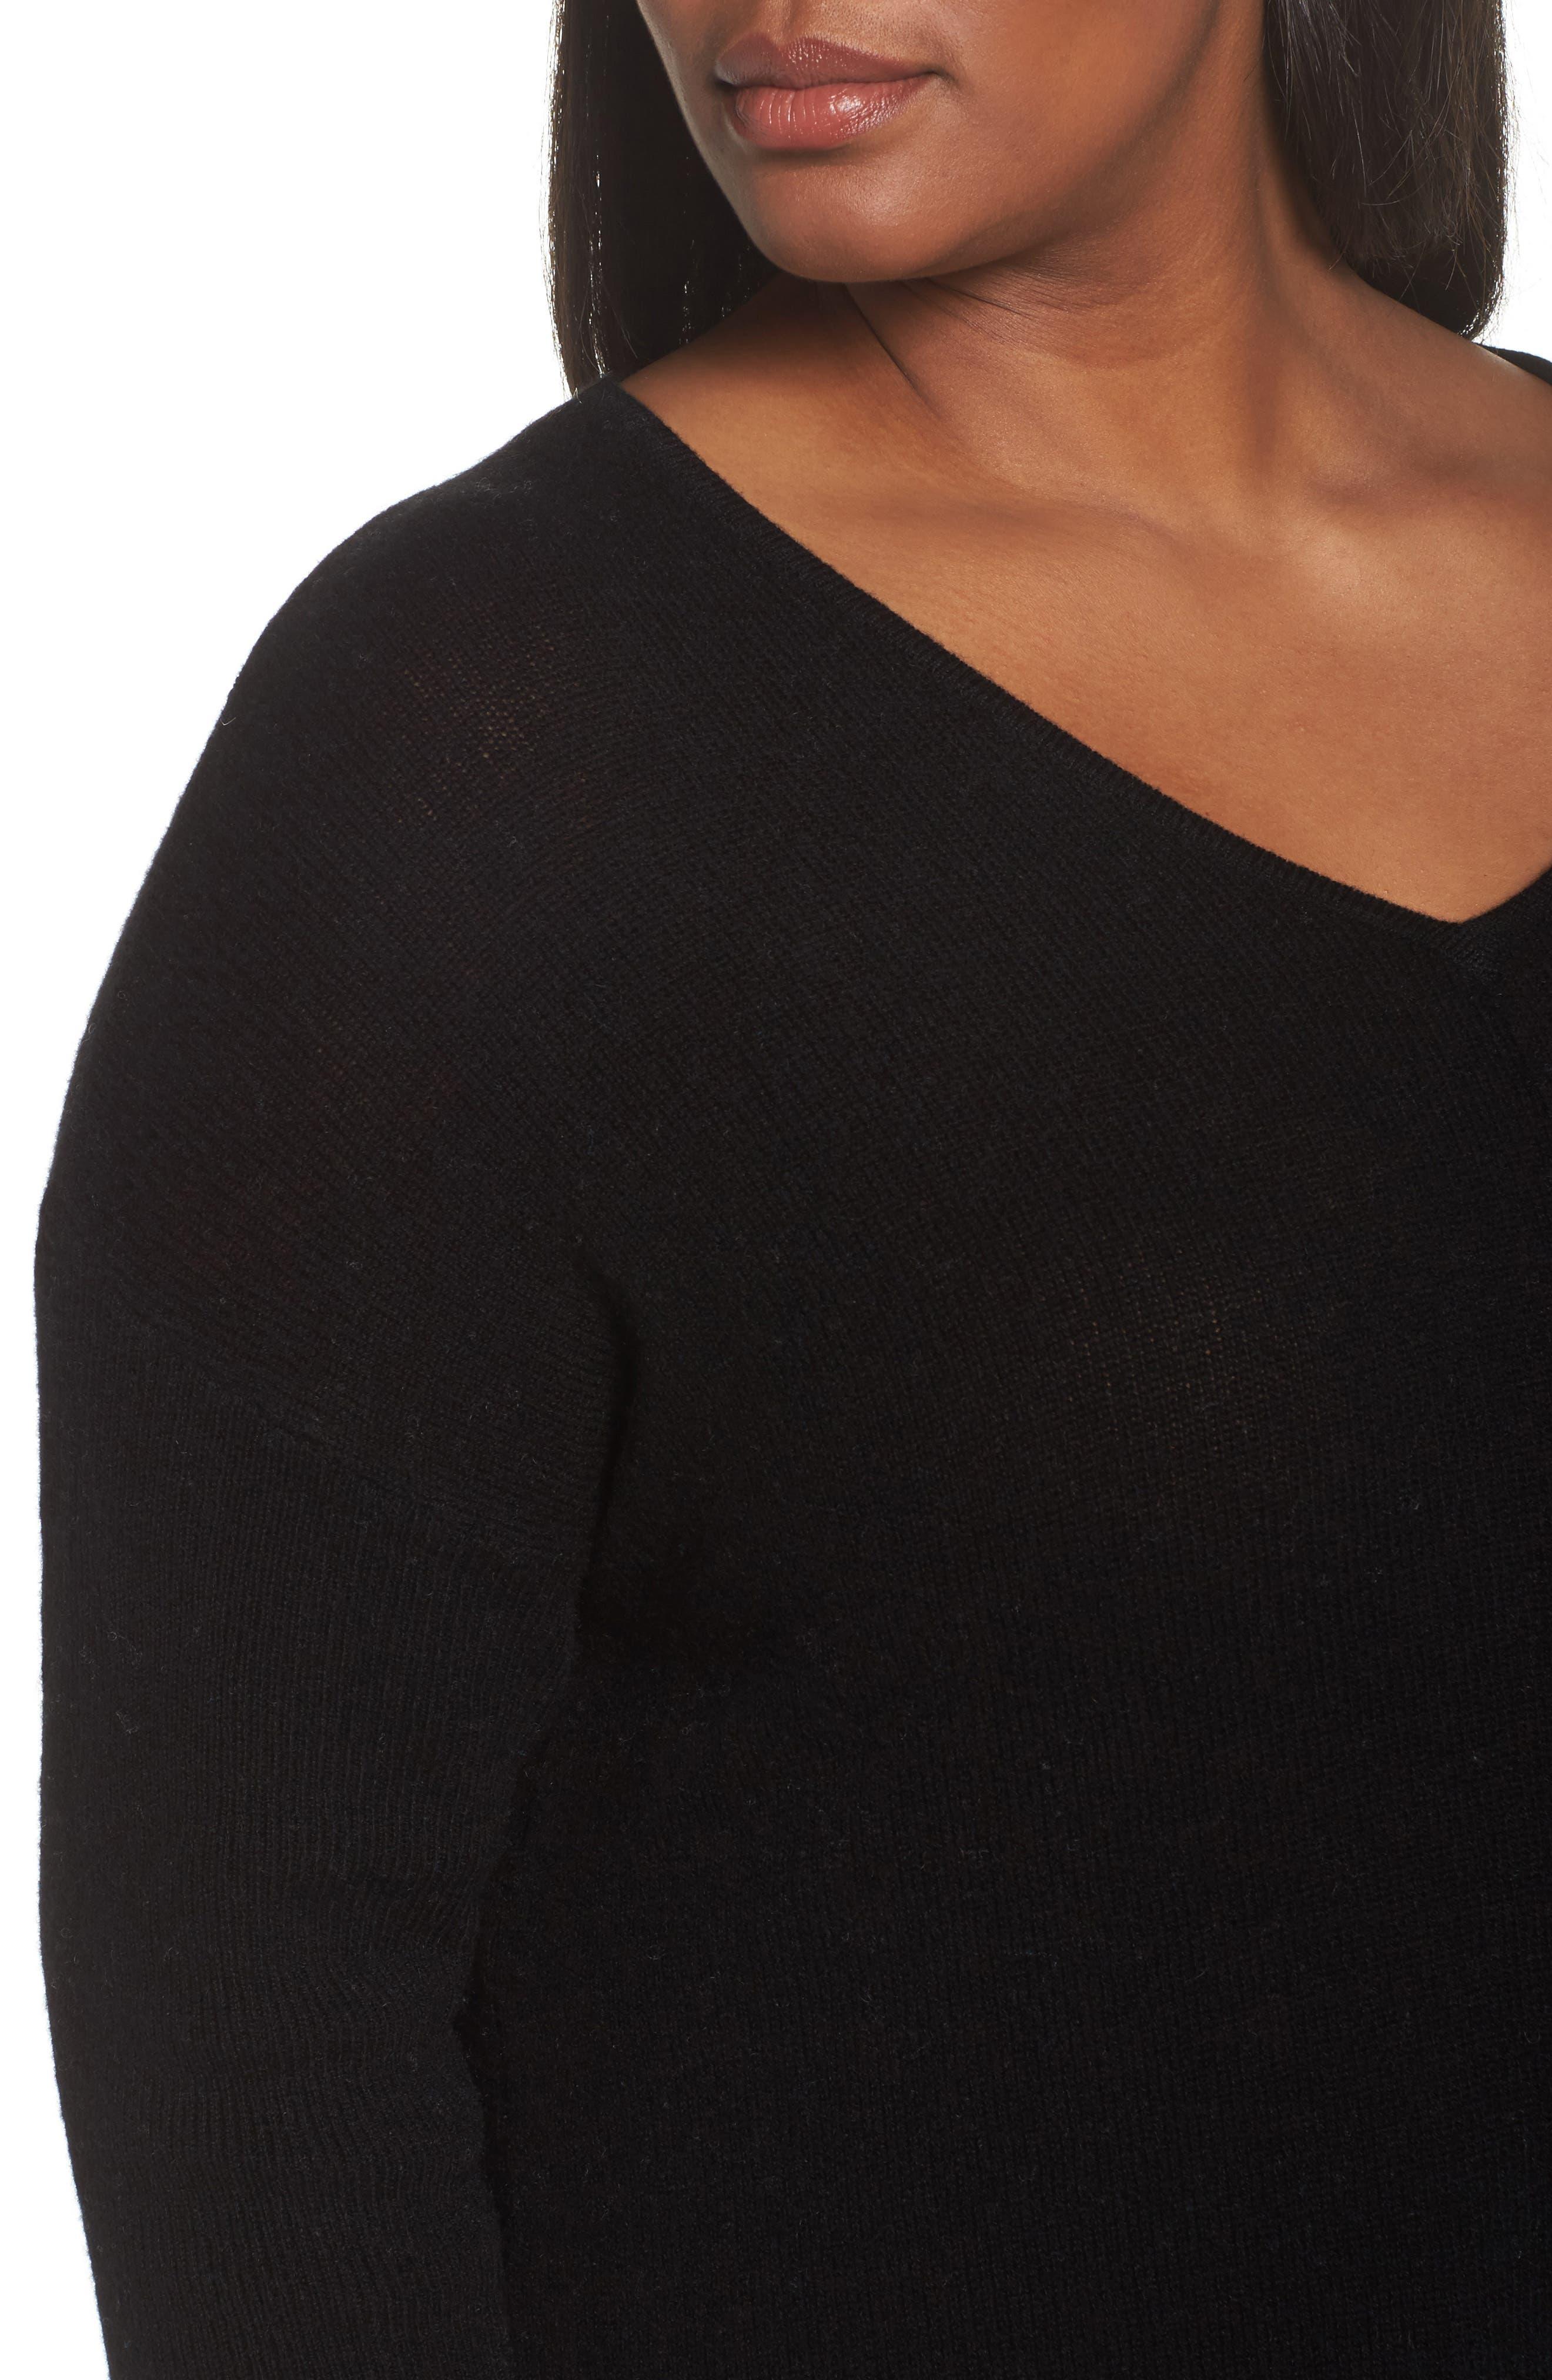 Easy V-Neck Wool & Cashmere Pullover,                             Alternate thumbnail 4, color,                             001